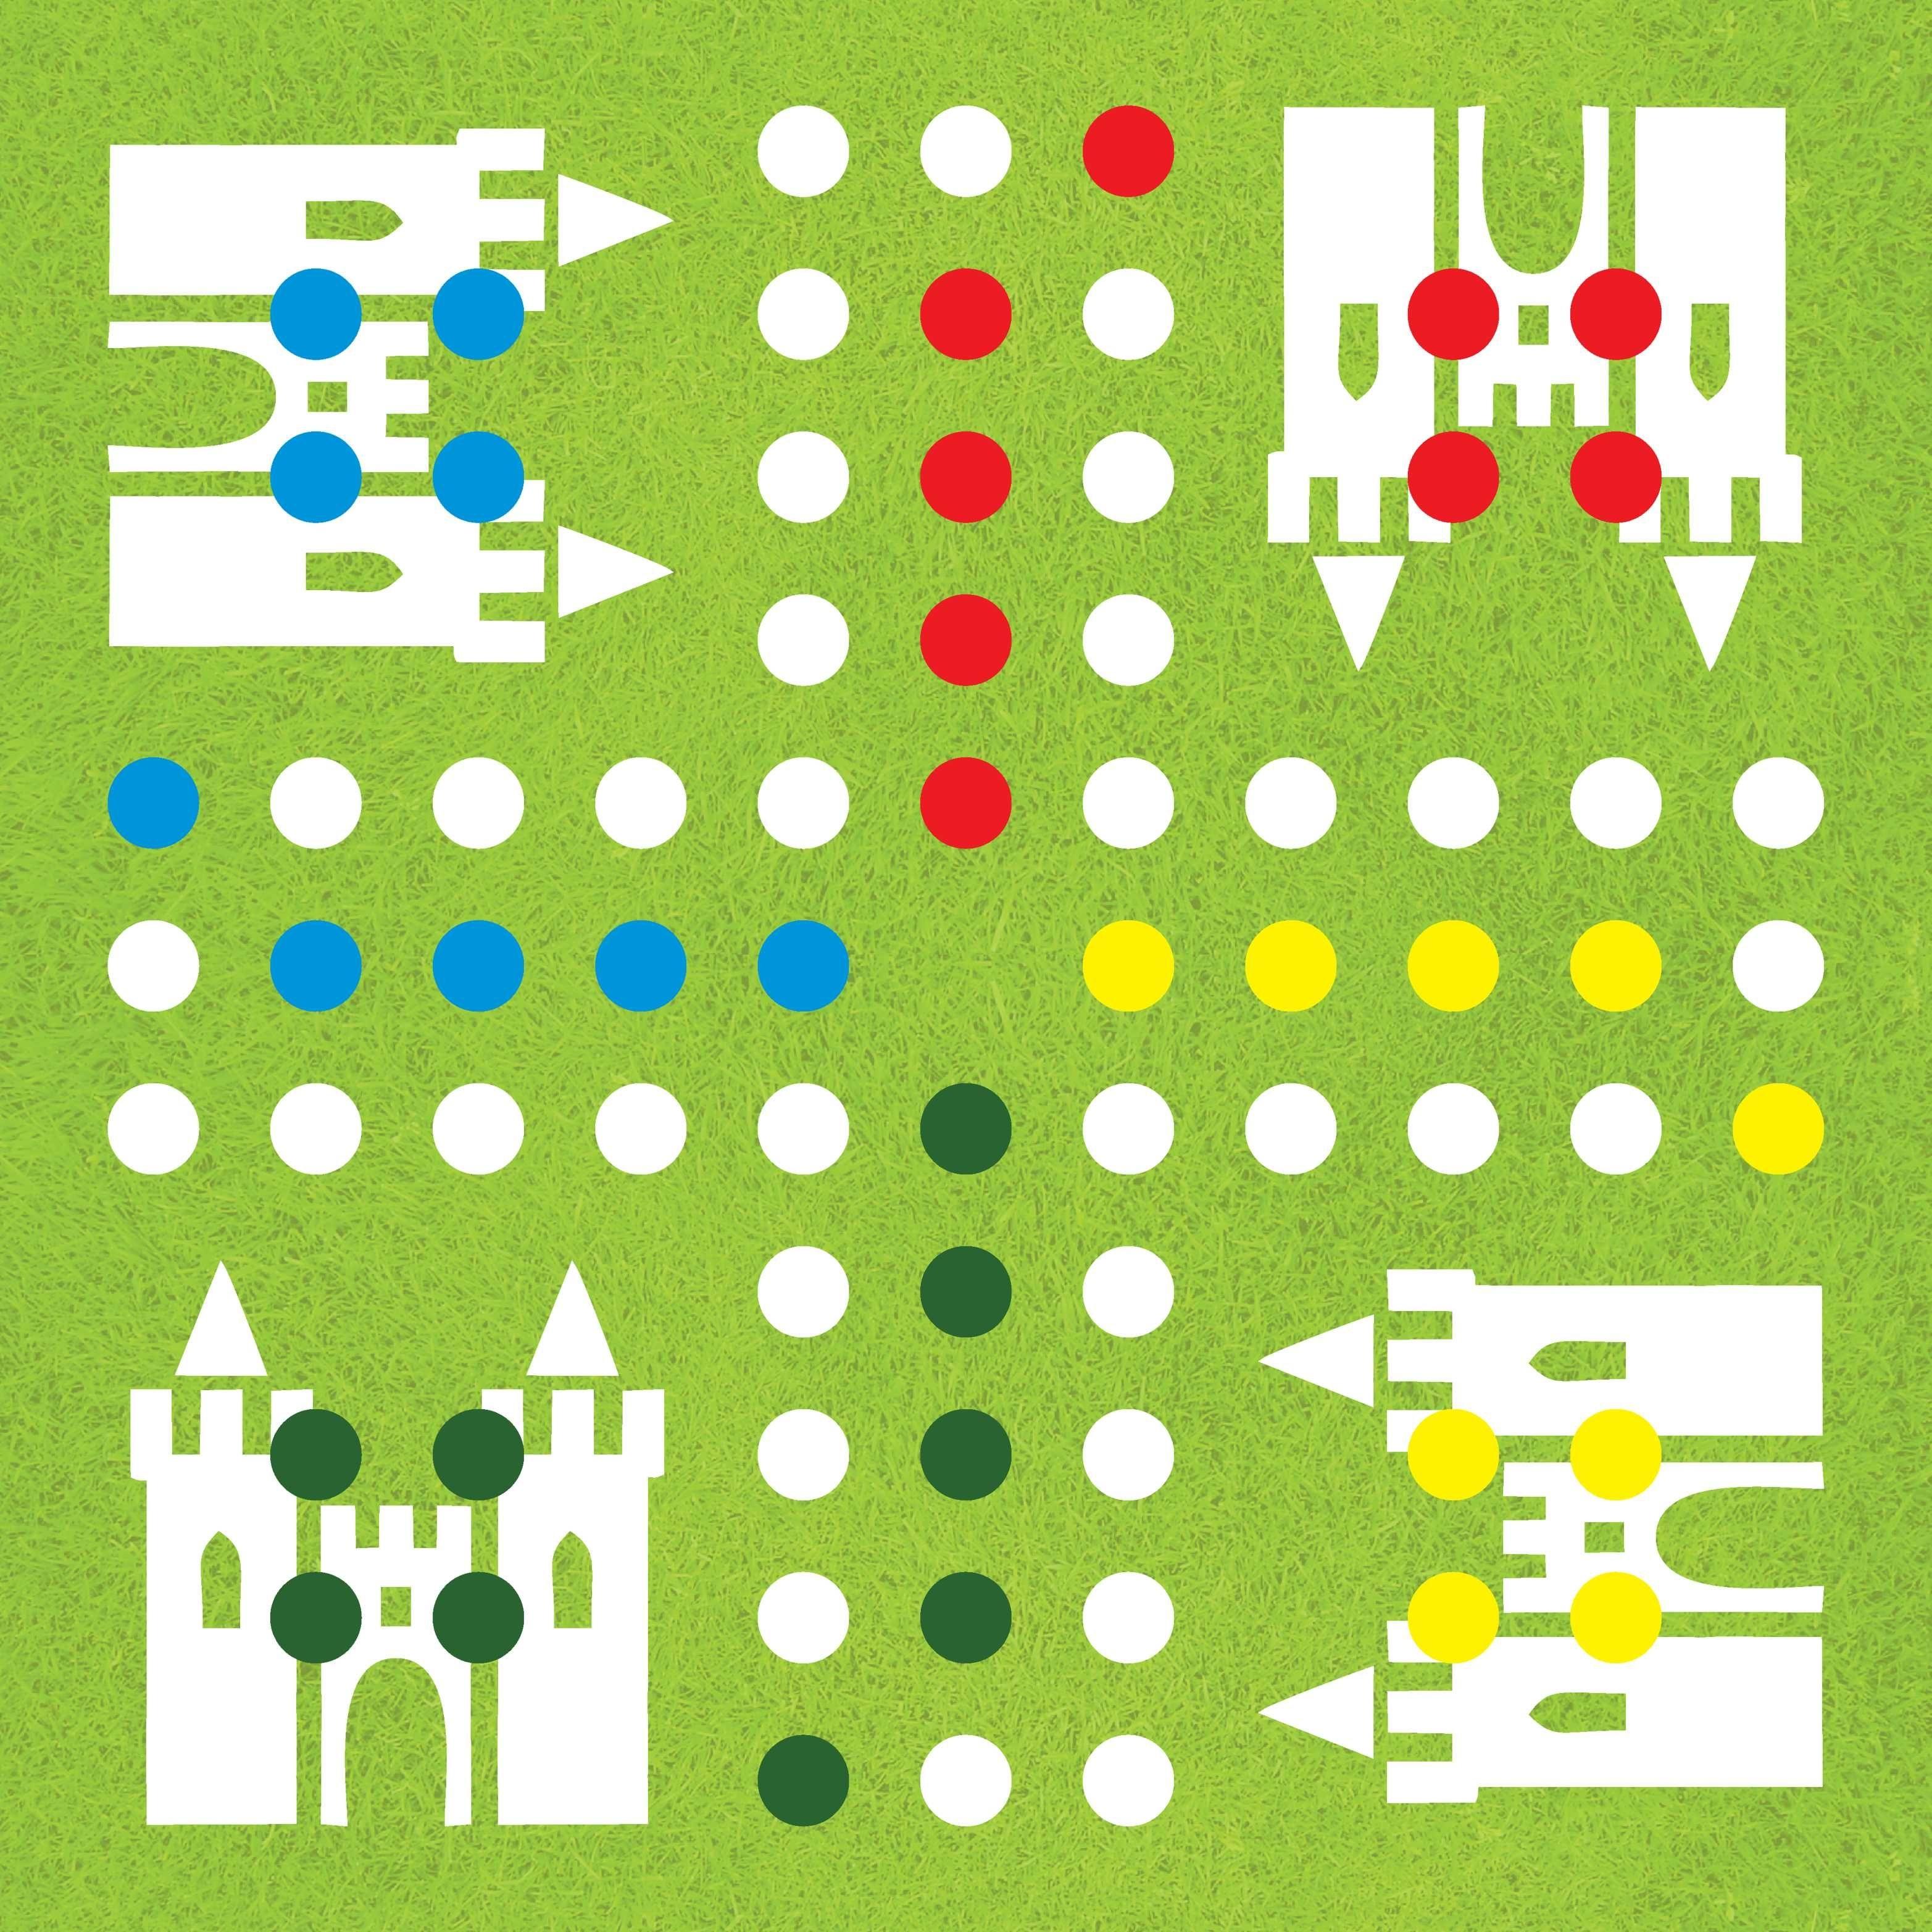 Diy-Ludo-Board-Game-Template - | Board Game | Társasjátékok, Játék - Free Printable Ludo Board